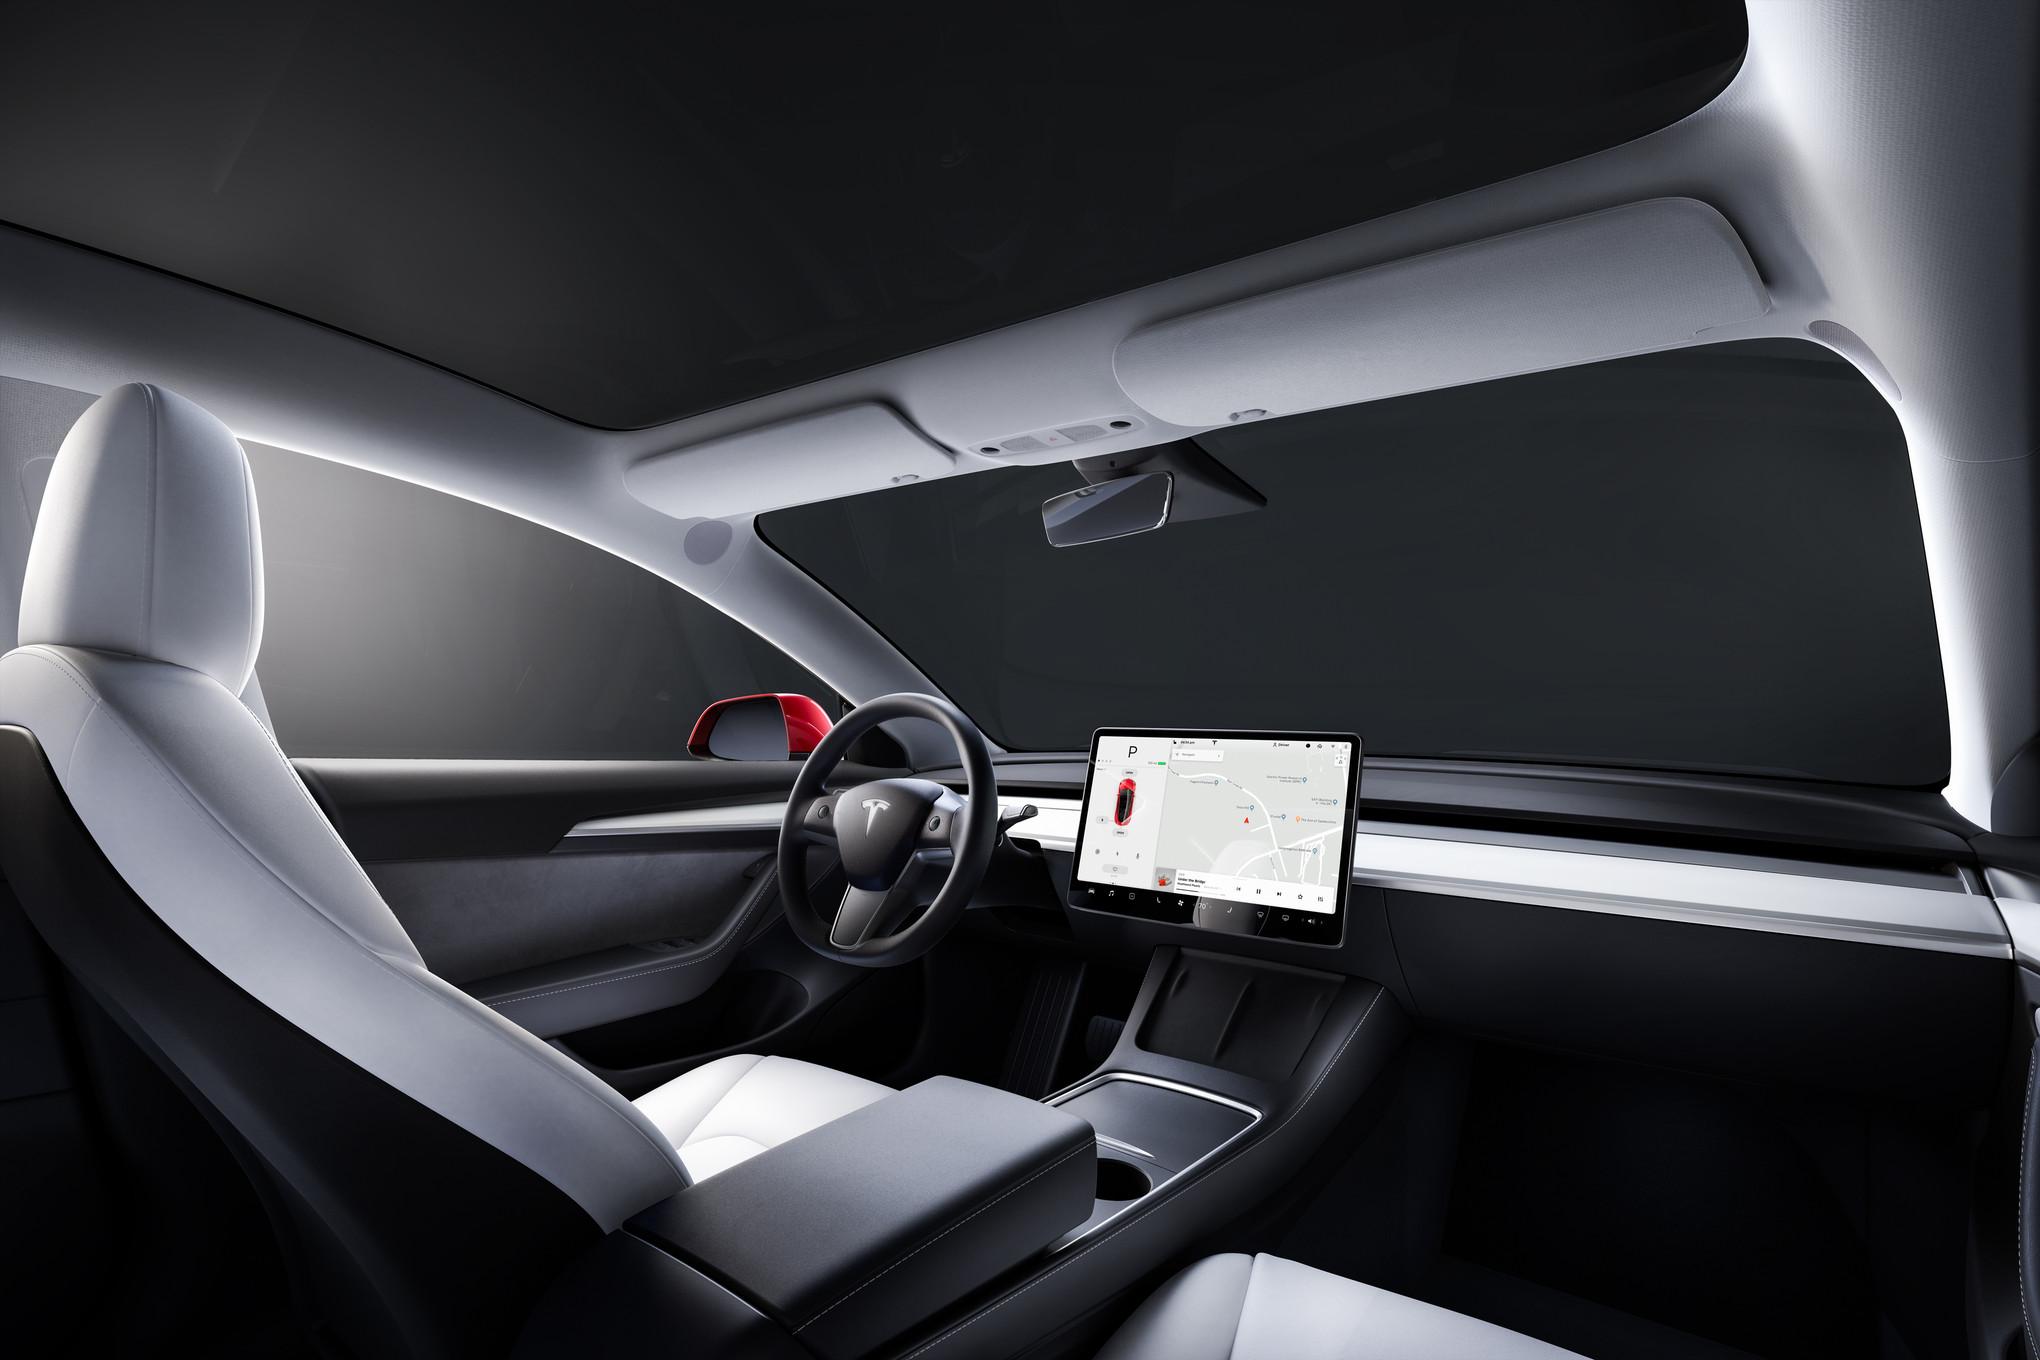 Tesla Autopilot Crashes: Interior of the Model 3